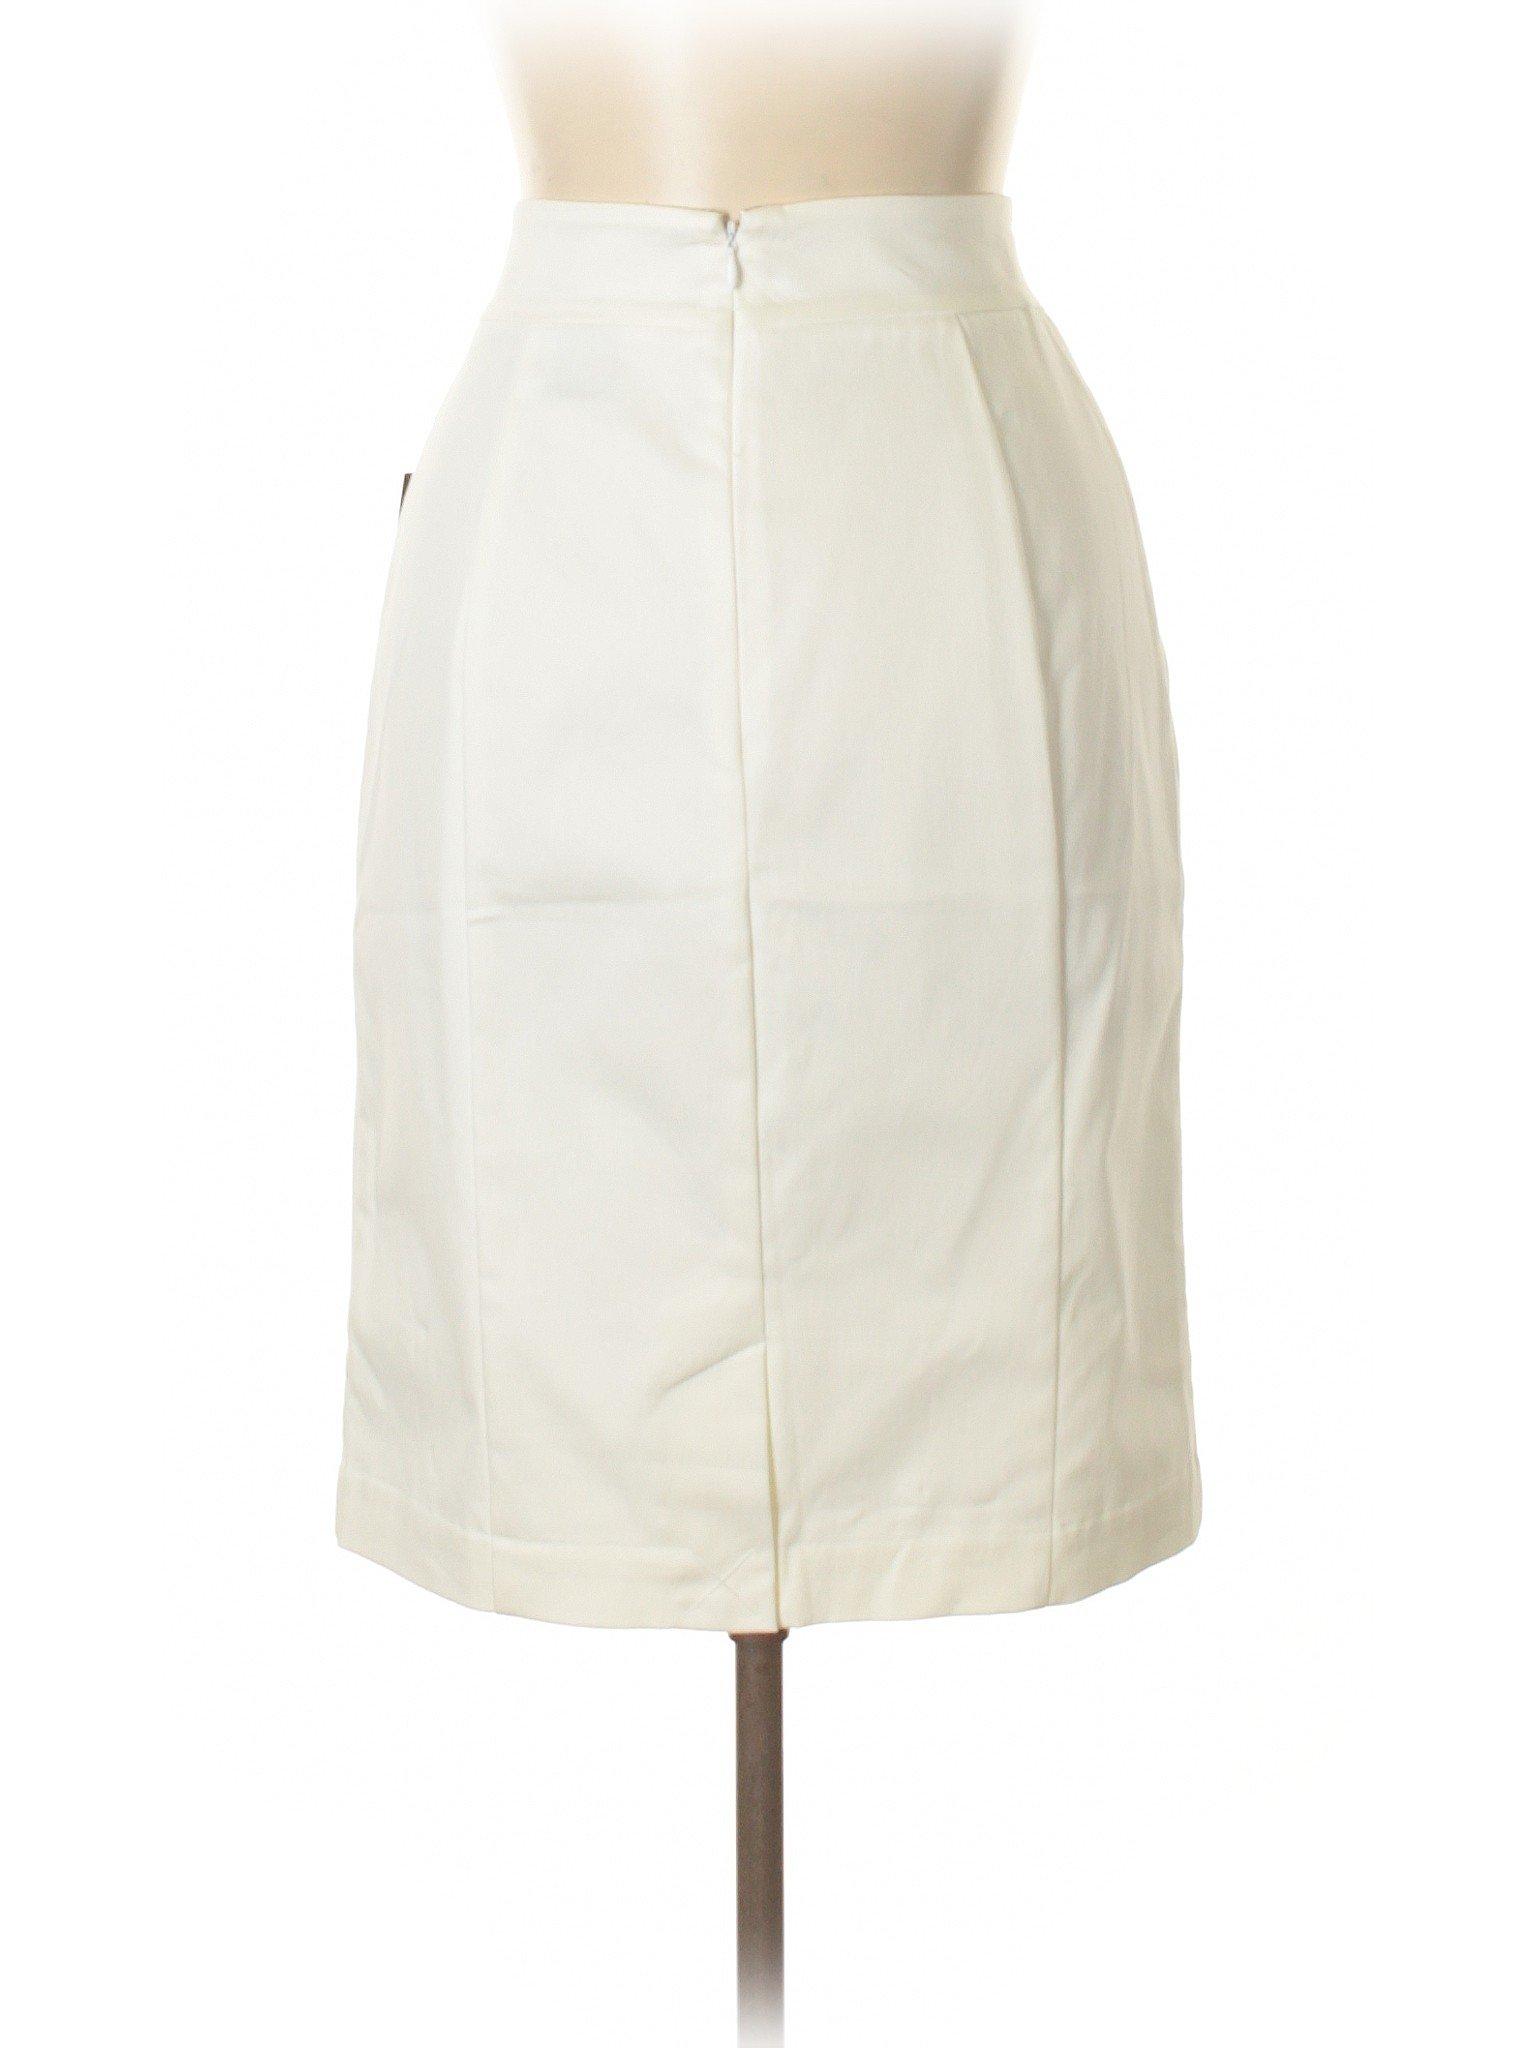 Worthington Boutique Casual Worthington Skirt Casual Casual Boutique Boutique Skirt Worthington Sq0wBS